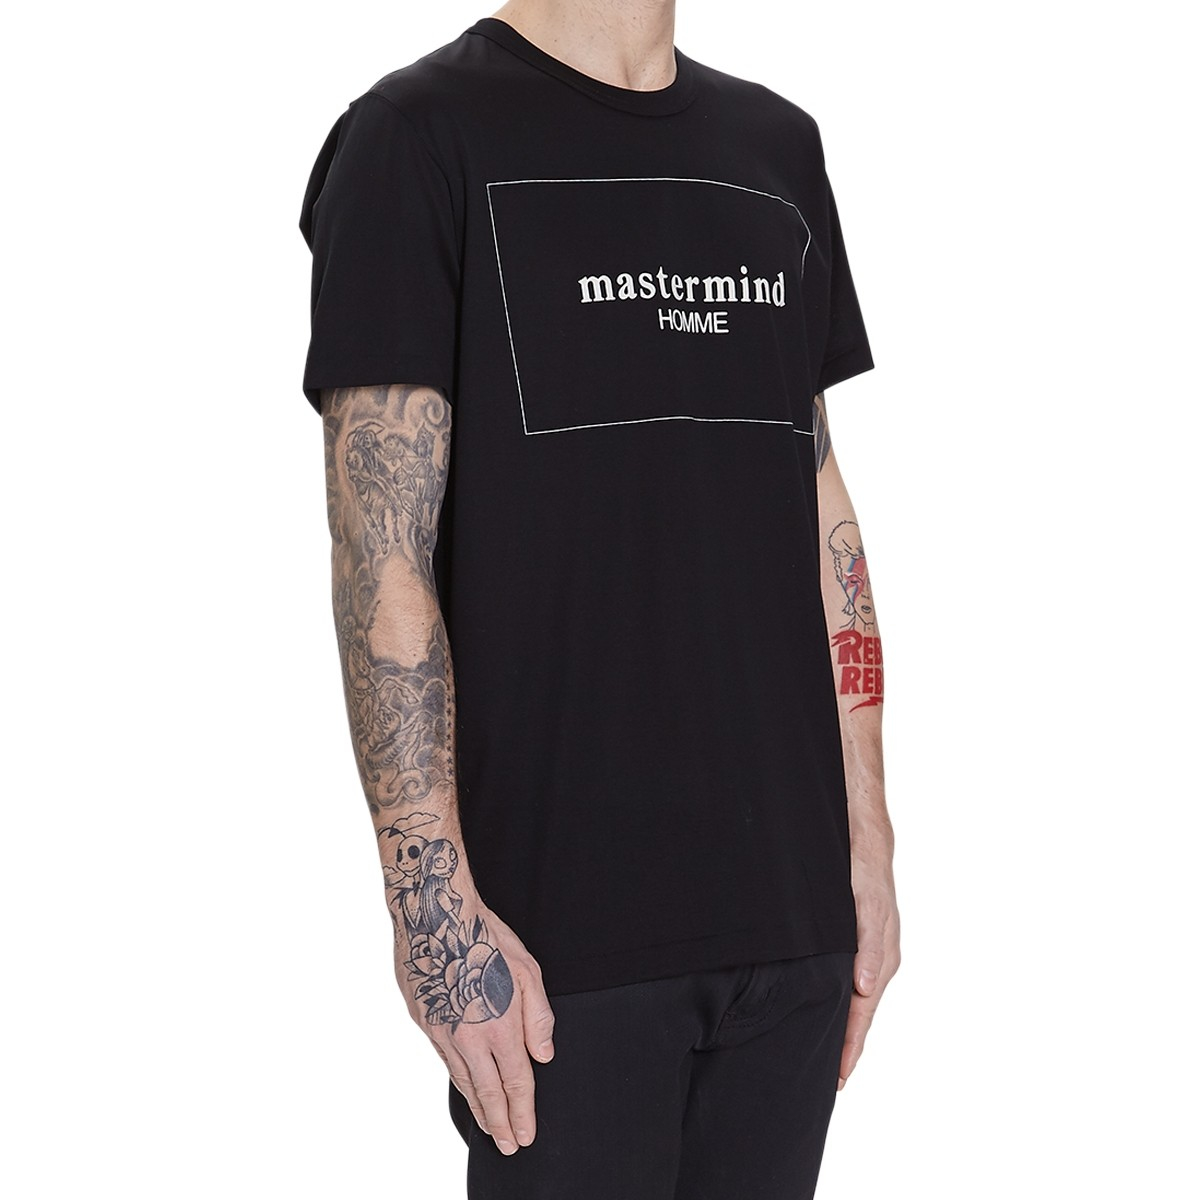 b056419ecefd8 Lyst - Mastermind Japan T-shirt in Black for Men